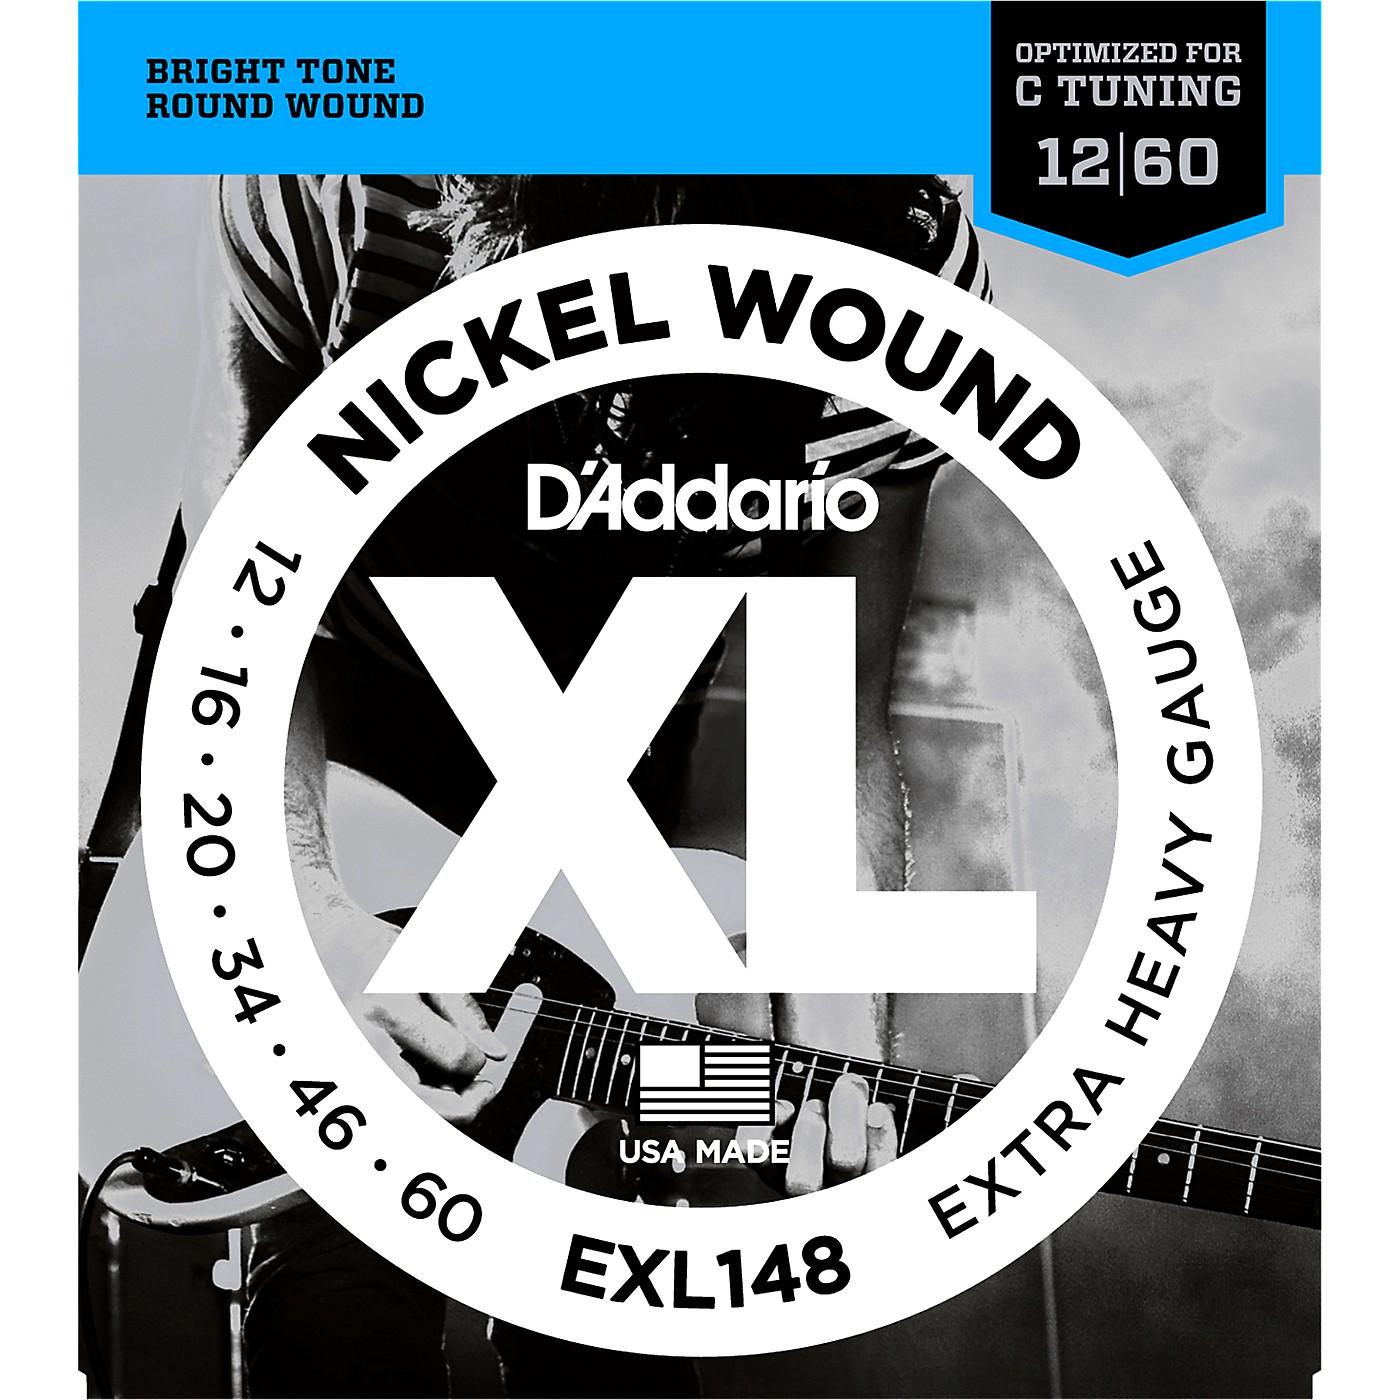 D'Addario XL148 Nickel-Wound, Drop C Tuning Electric Guitar Strings thumbnail